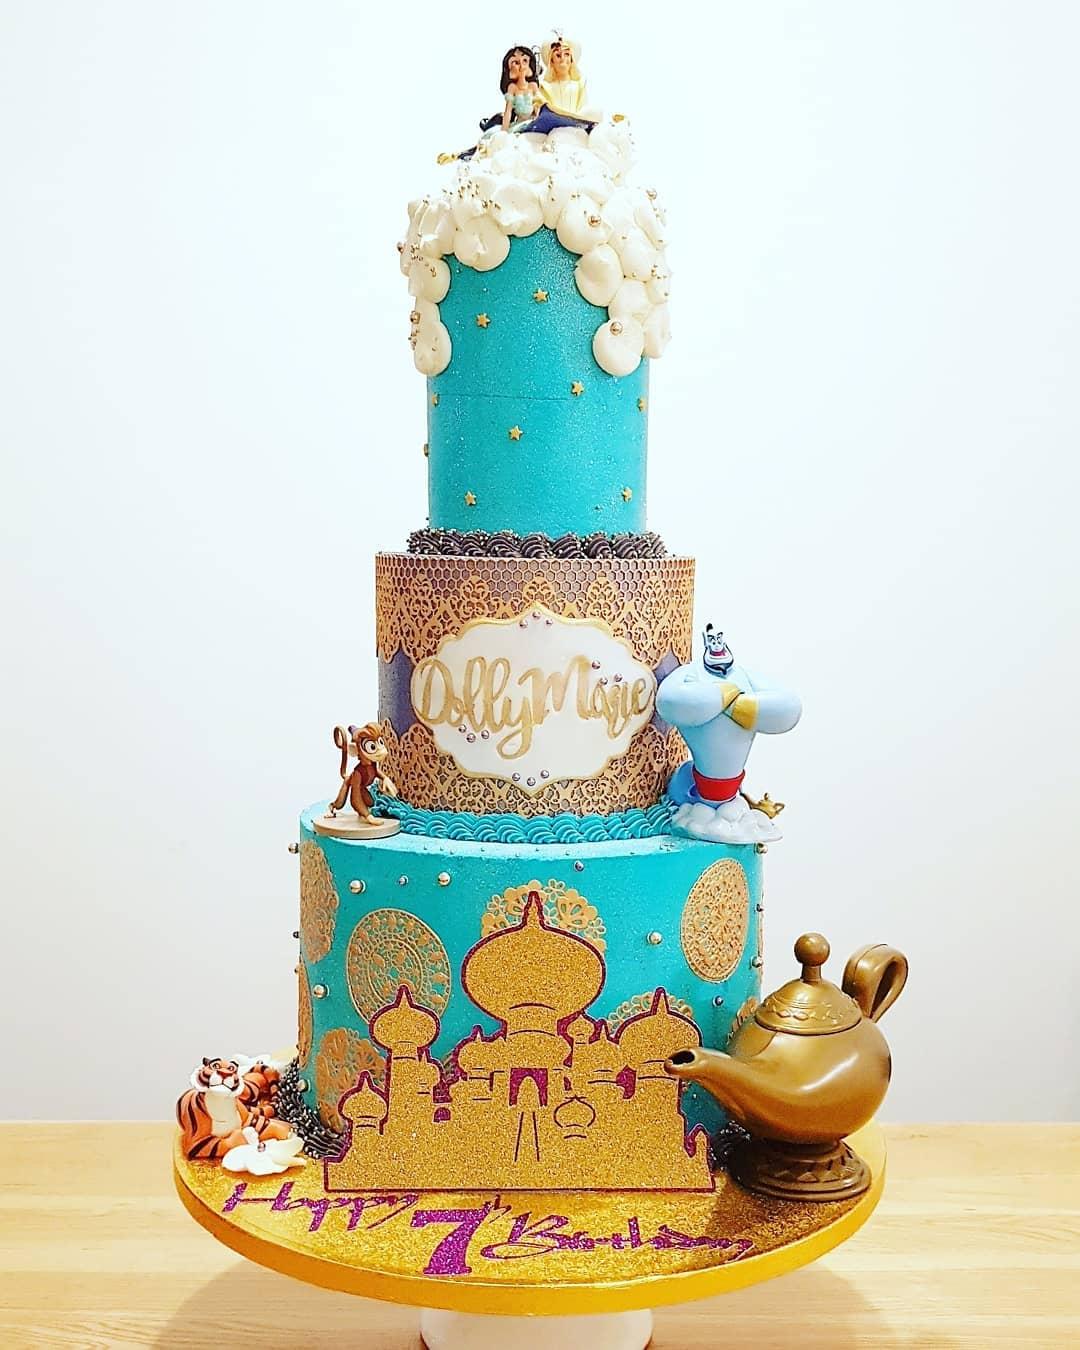 Aladdin themed cake